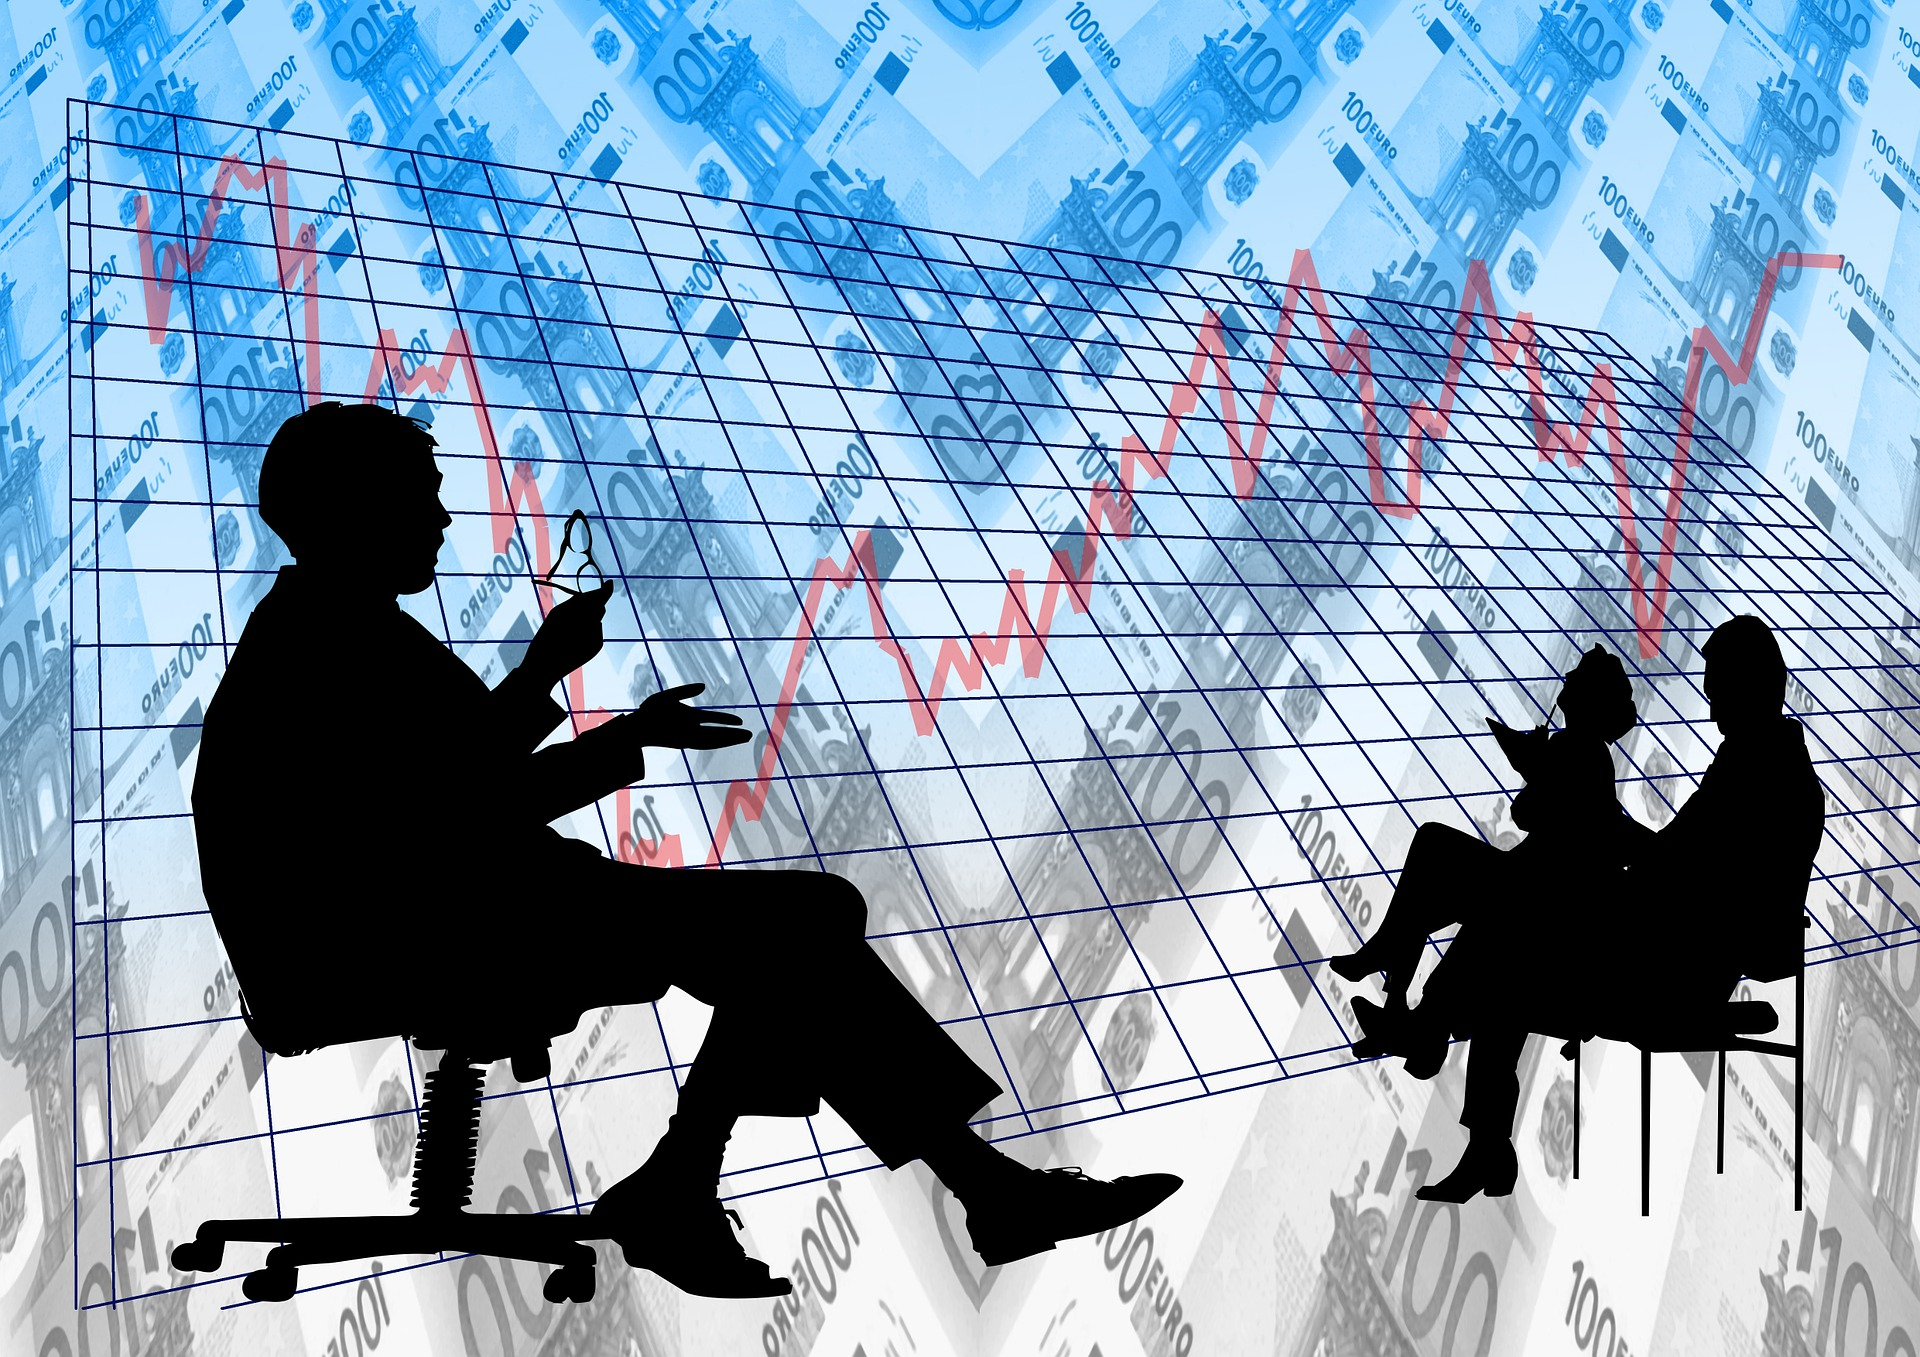 OECD景気見通しのアップサイドシナリオ、ダウンサイドシナリオ